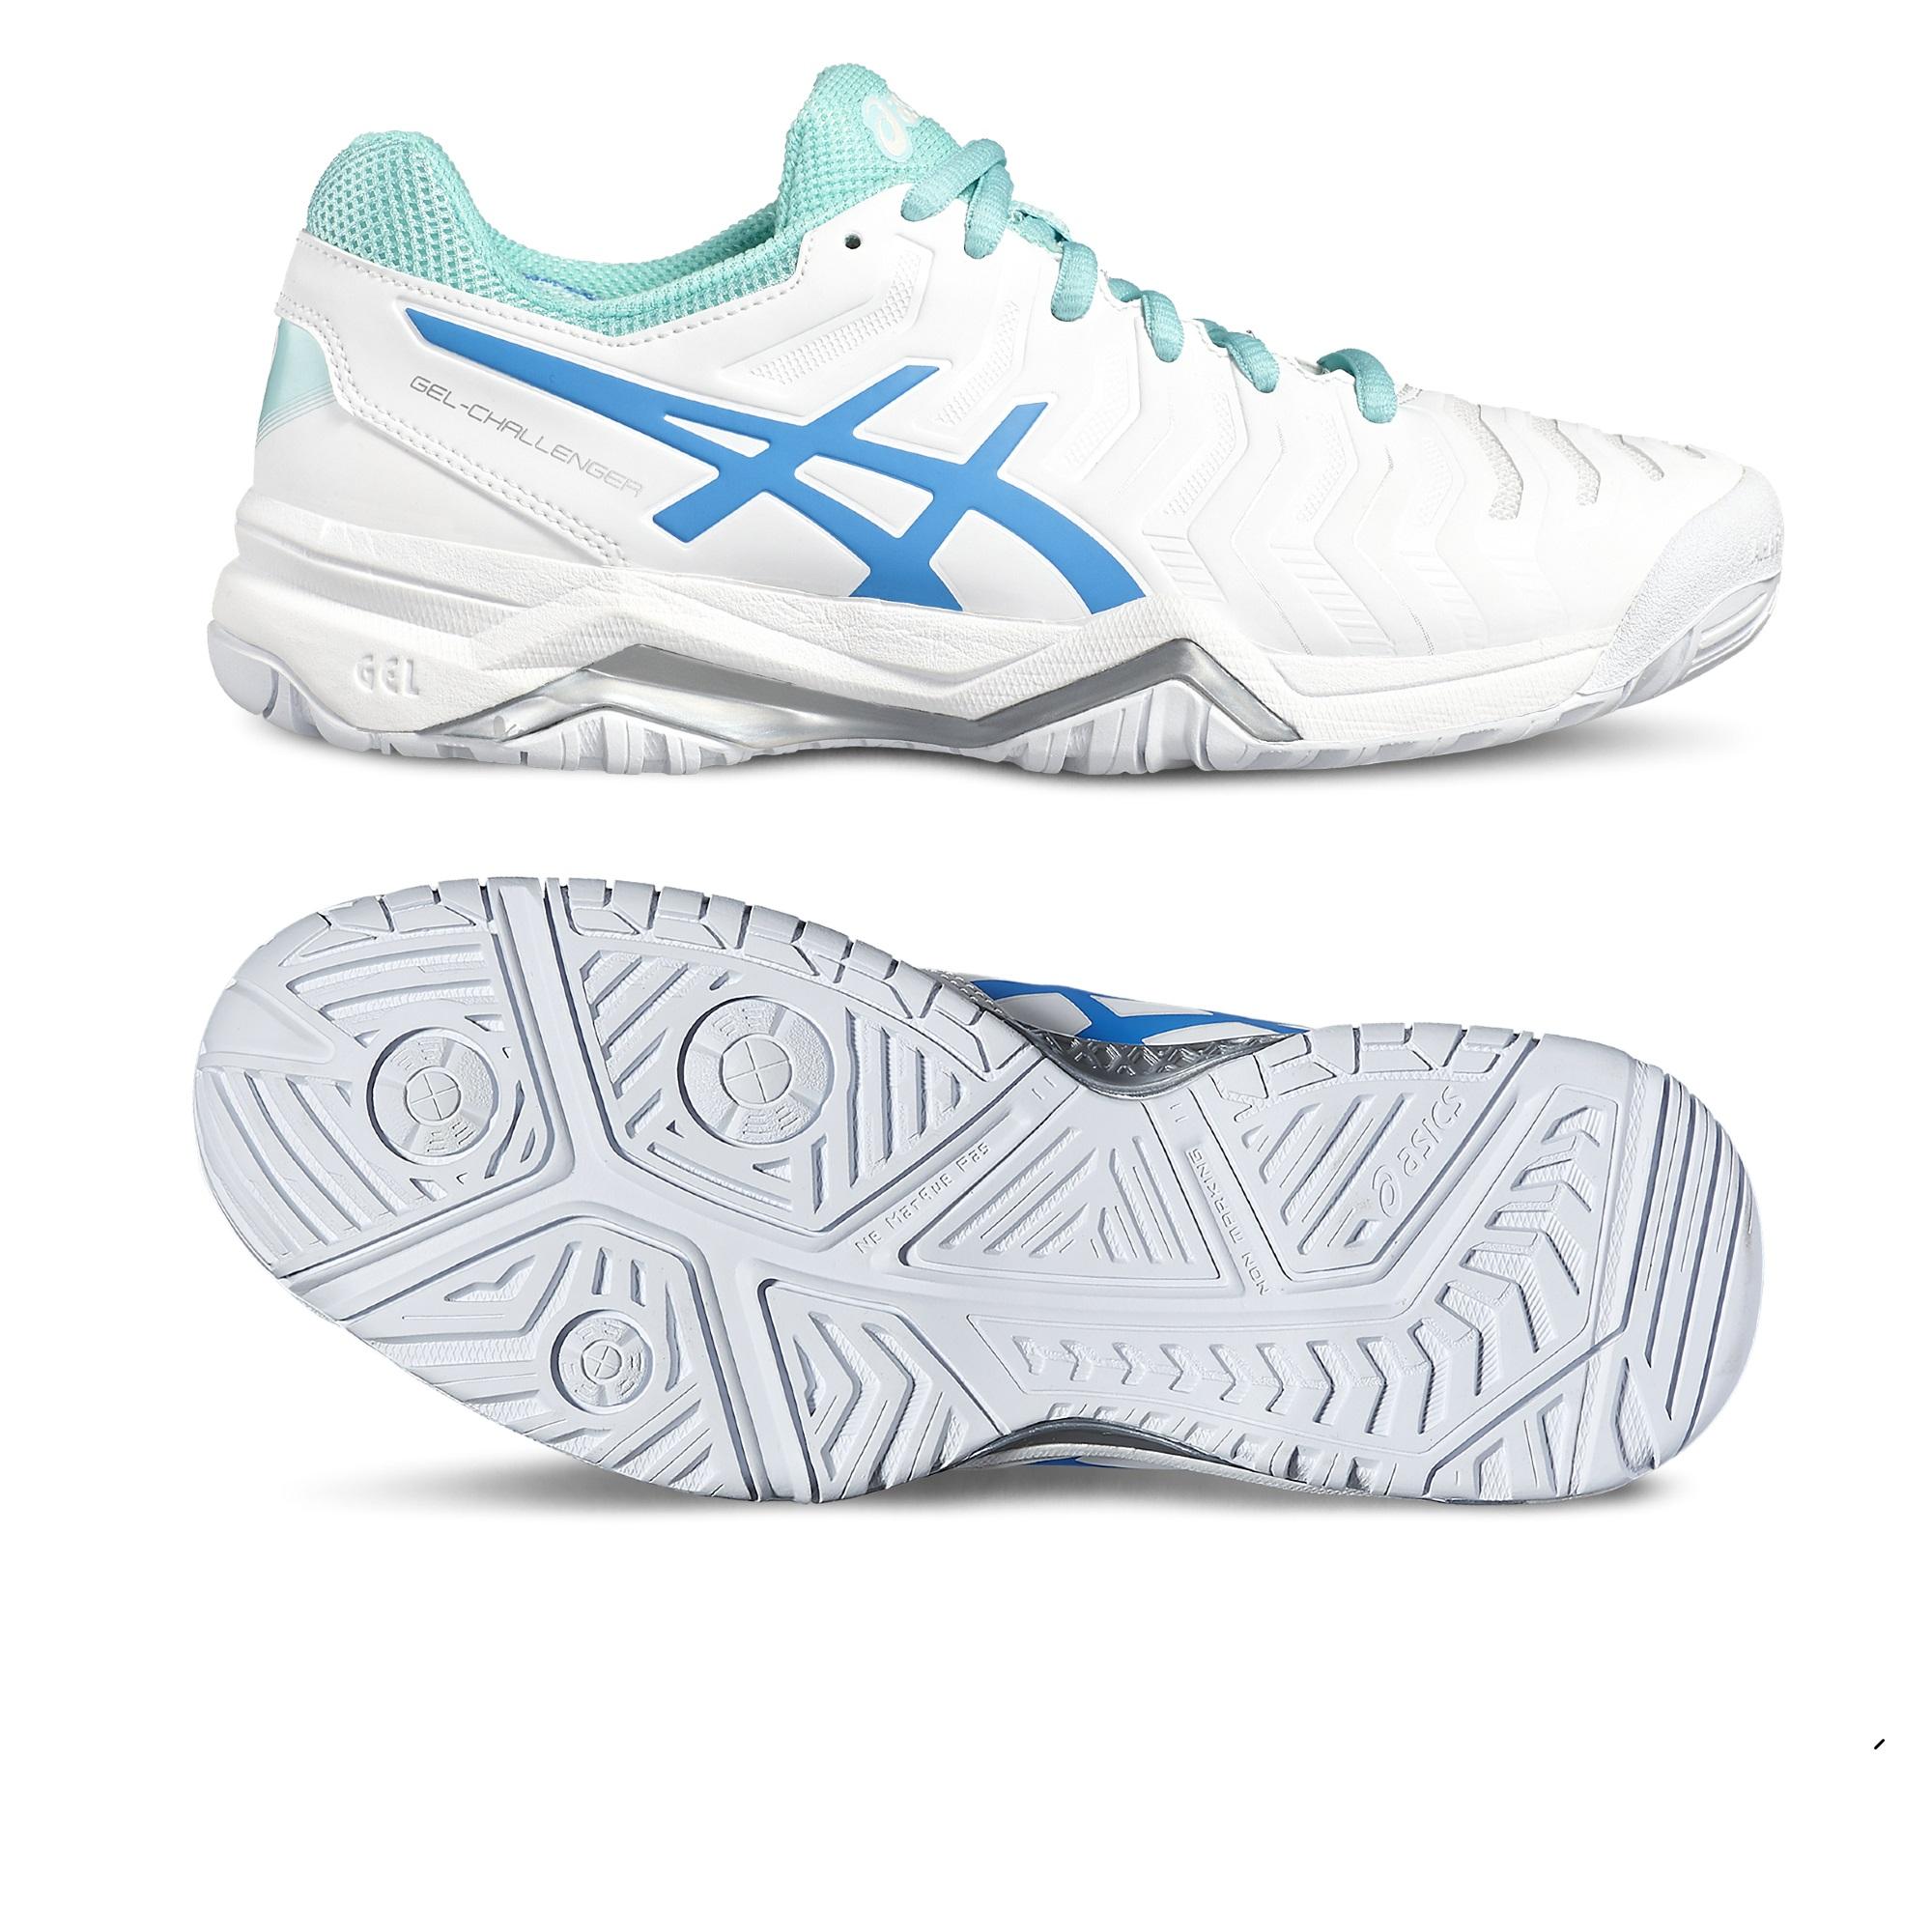 Asics GelChallenger 11 Ladies Tennis Shoes  WhiteBlue 7.5 UK